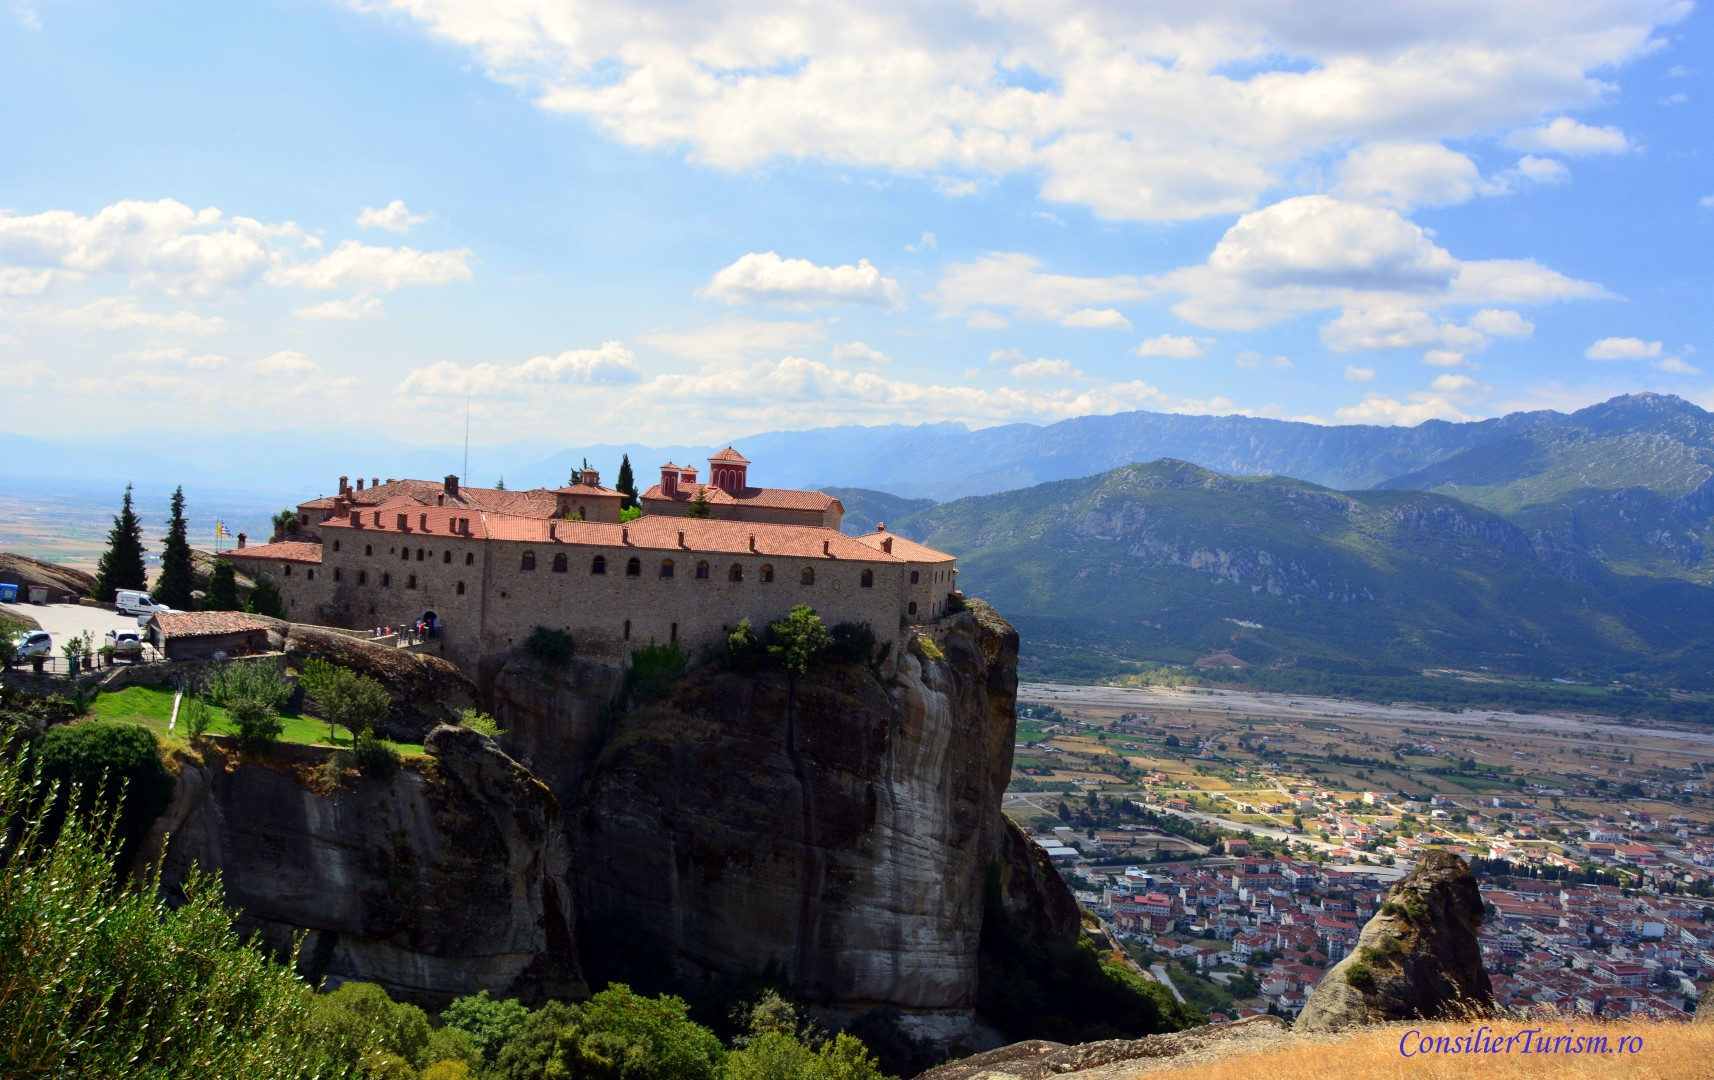 Manastirea Sf Stefan Meteora